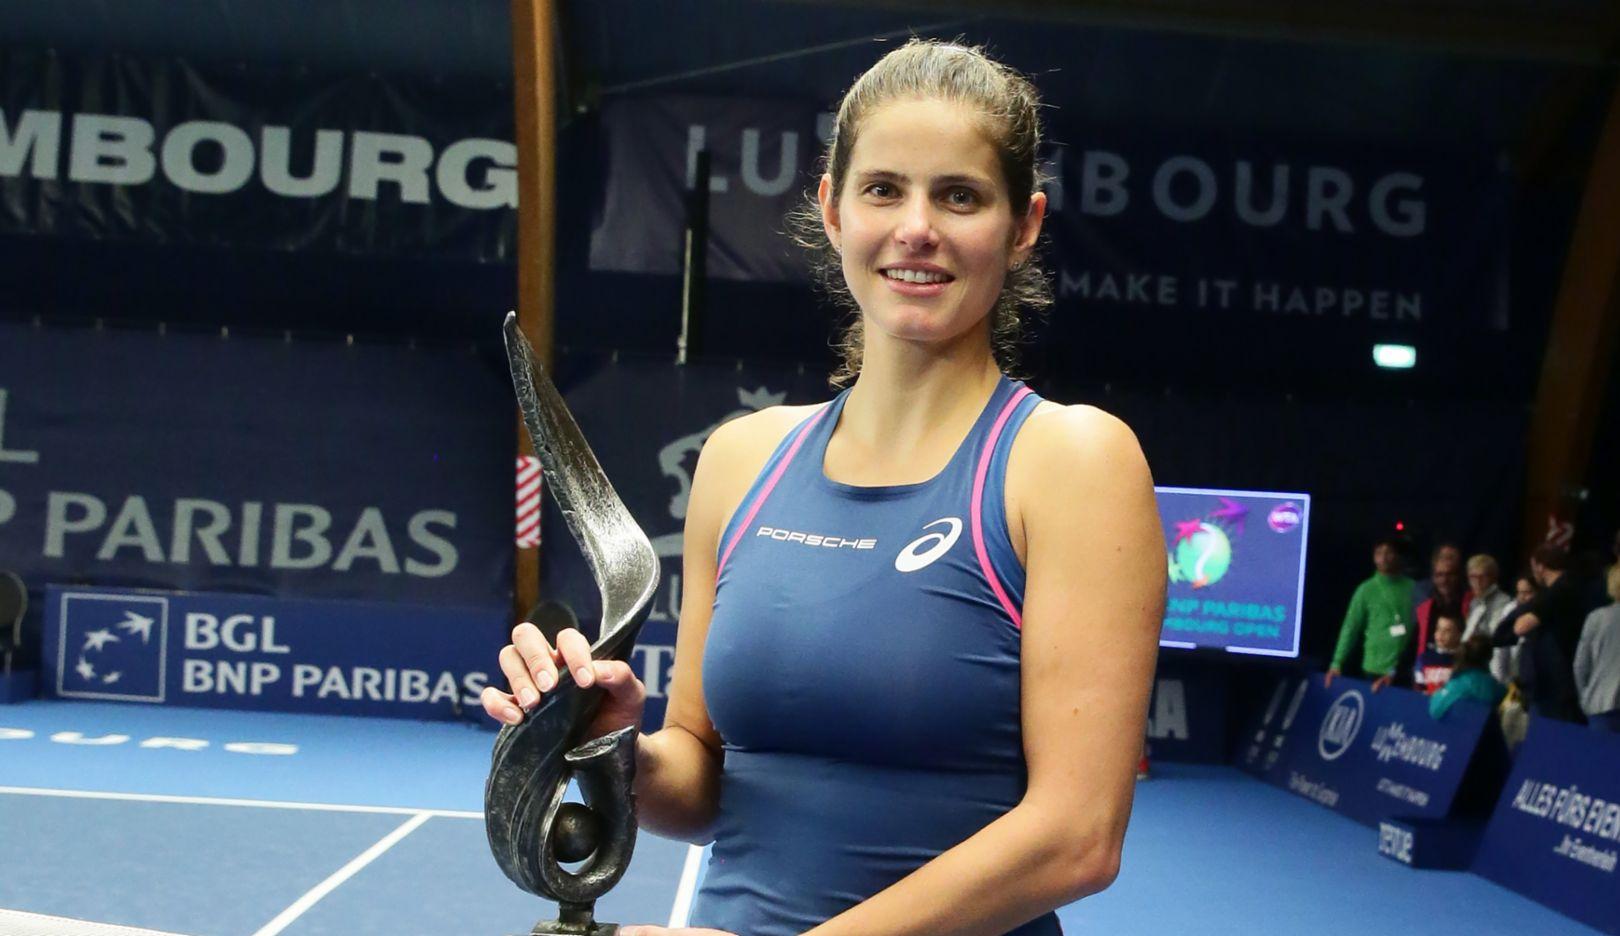 Julia Gorges Wins Wta Tournament In Luxemburg